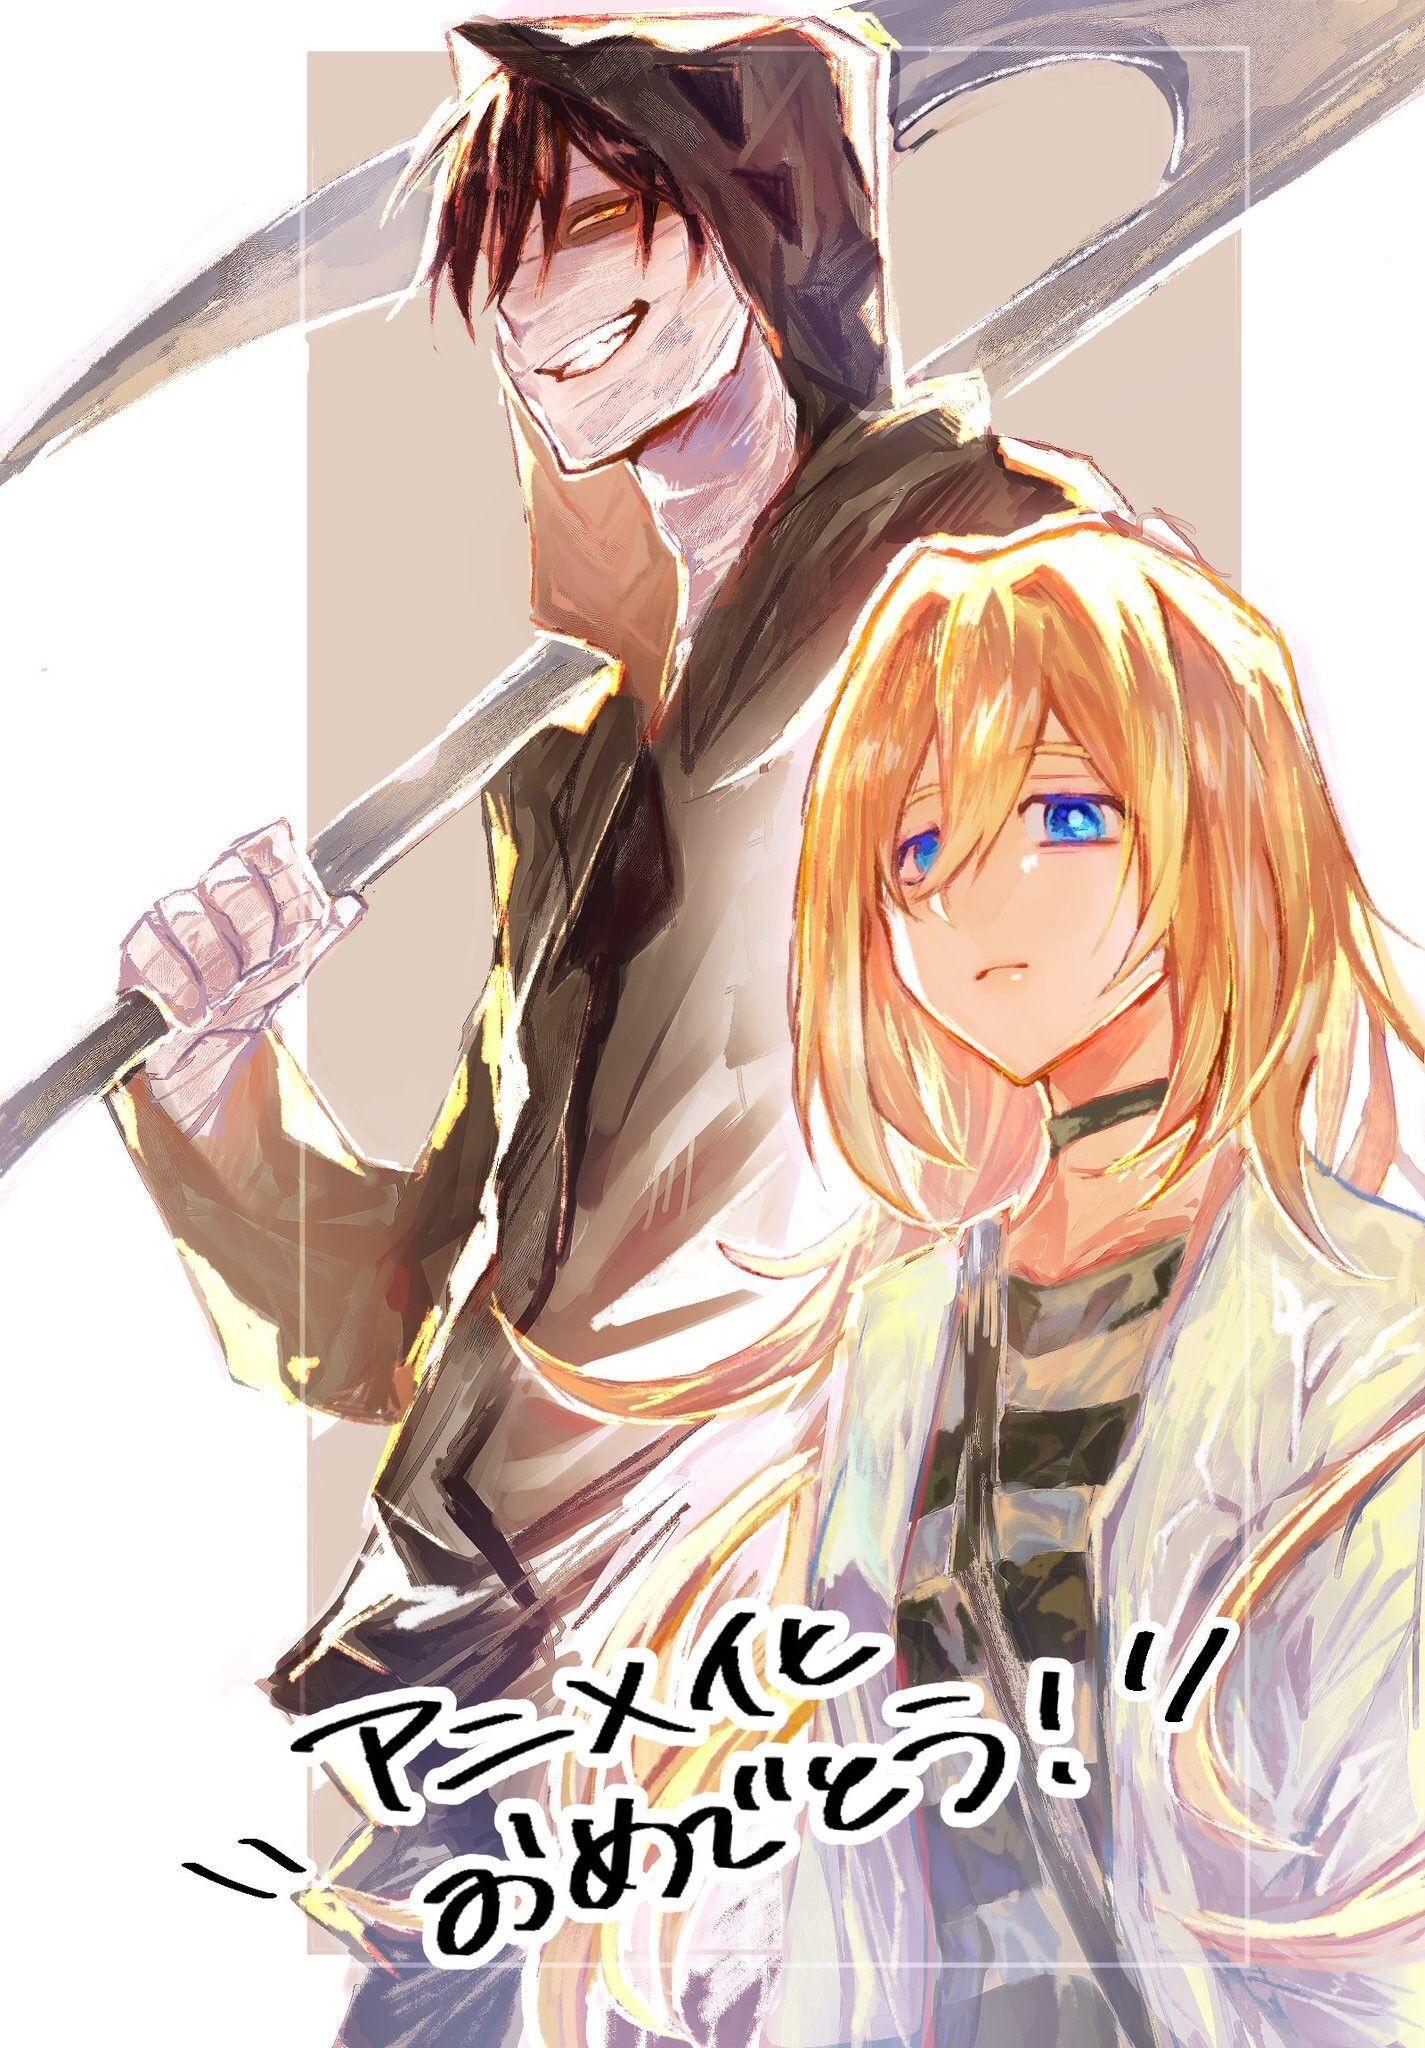 Pin by ♡ Λℓicε ♡ on Satsuriku no Tenshi in 2020 Angel of